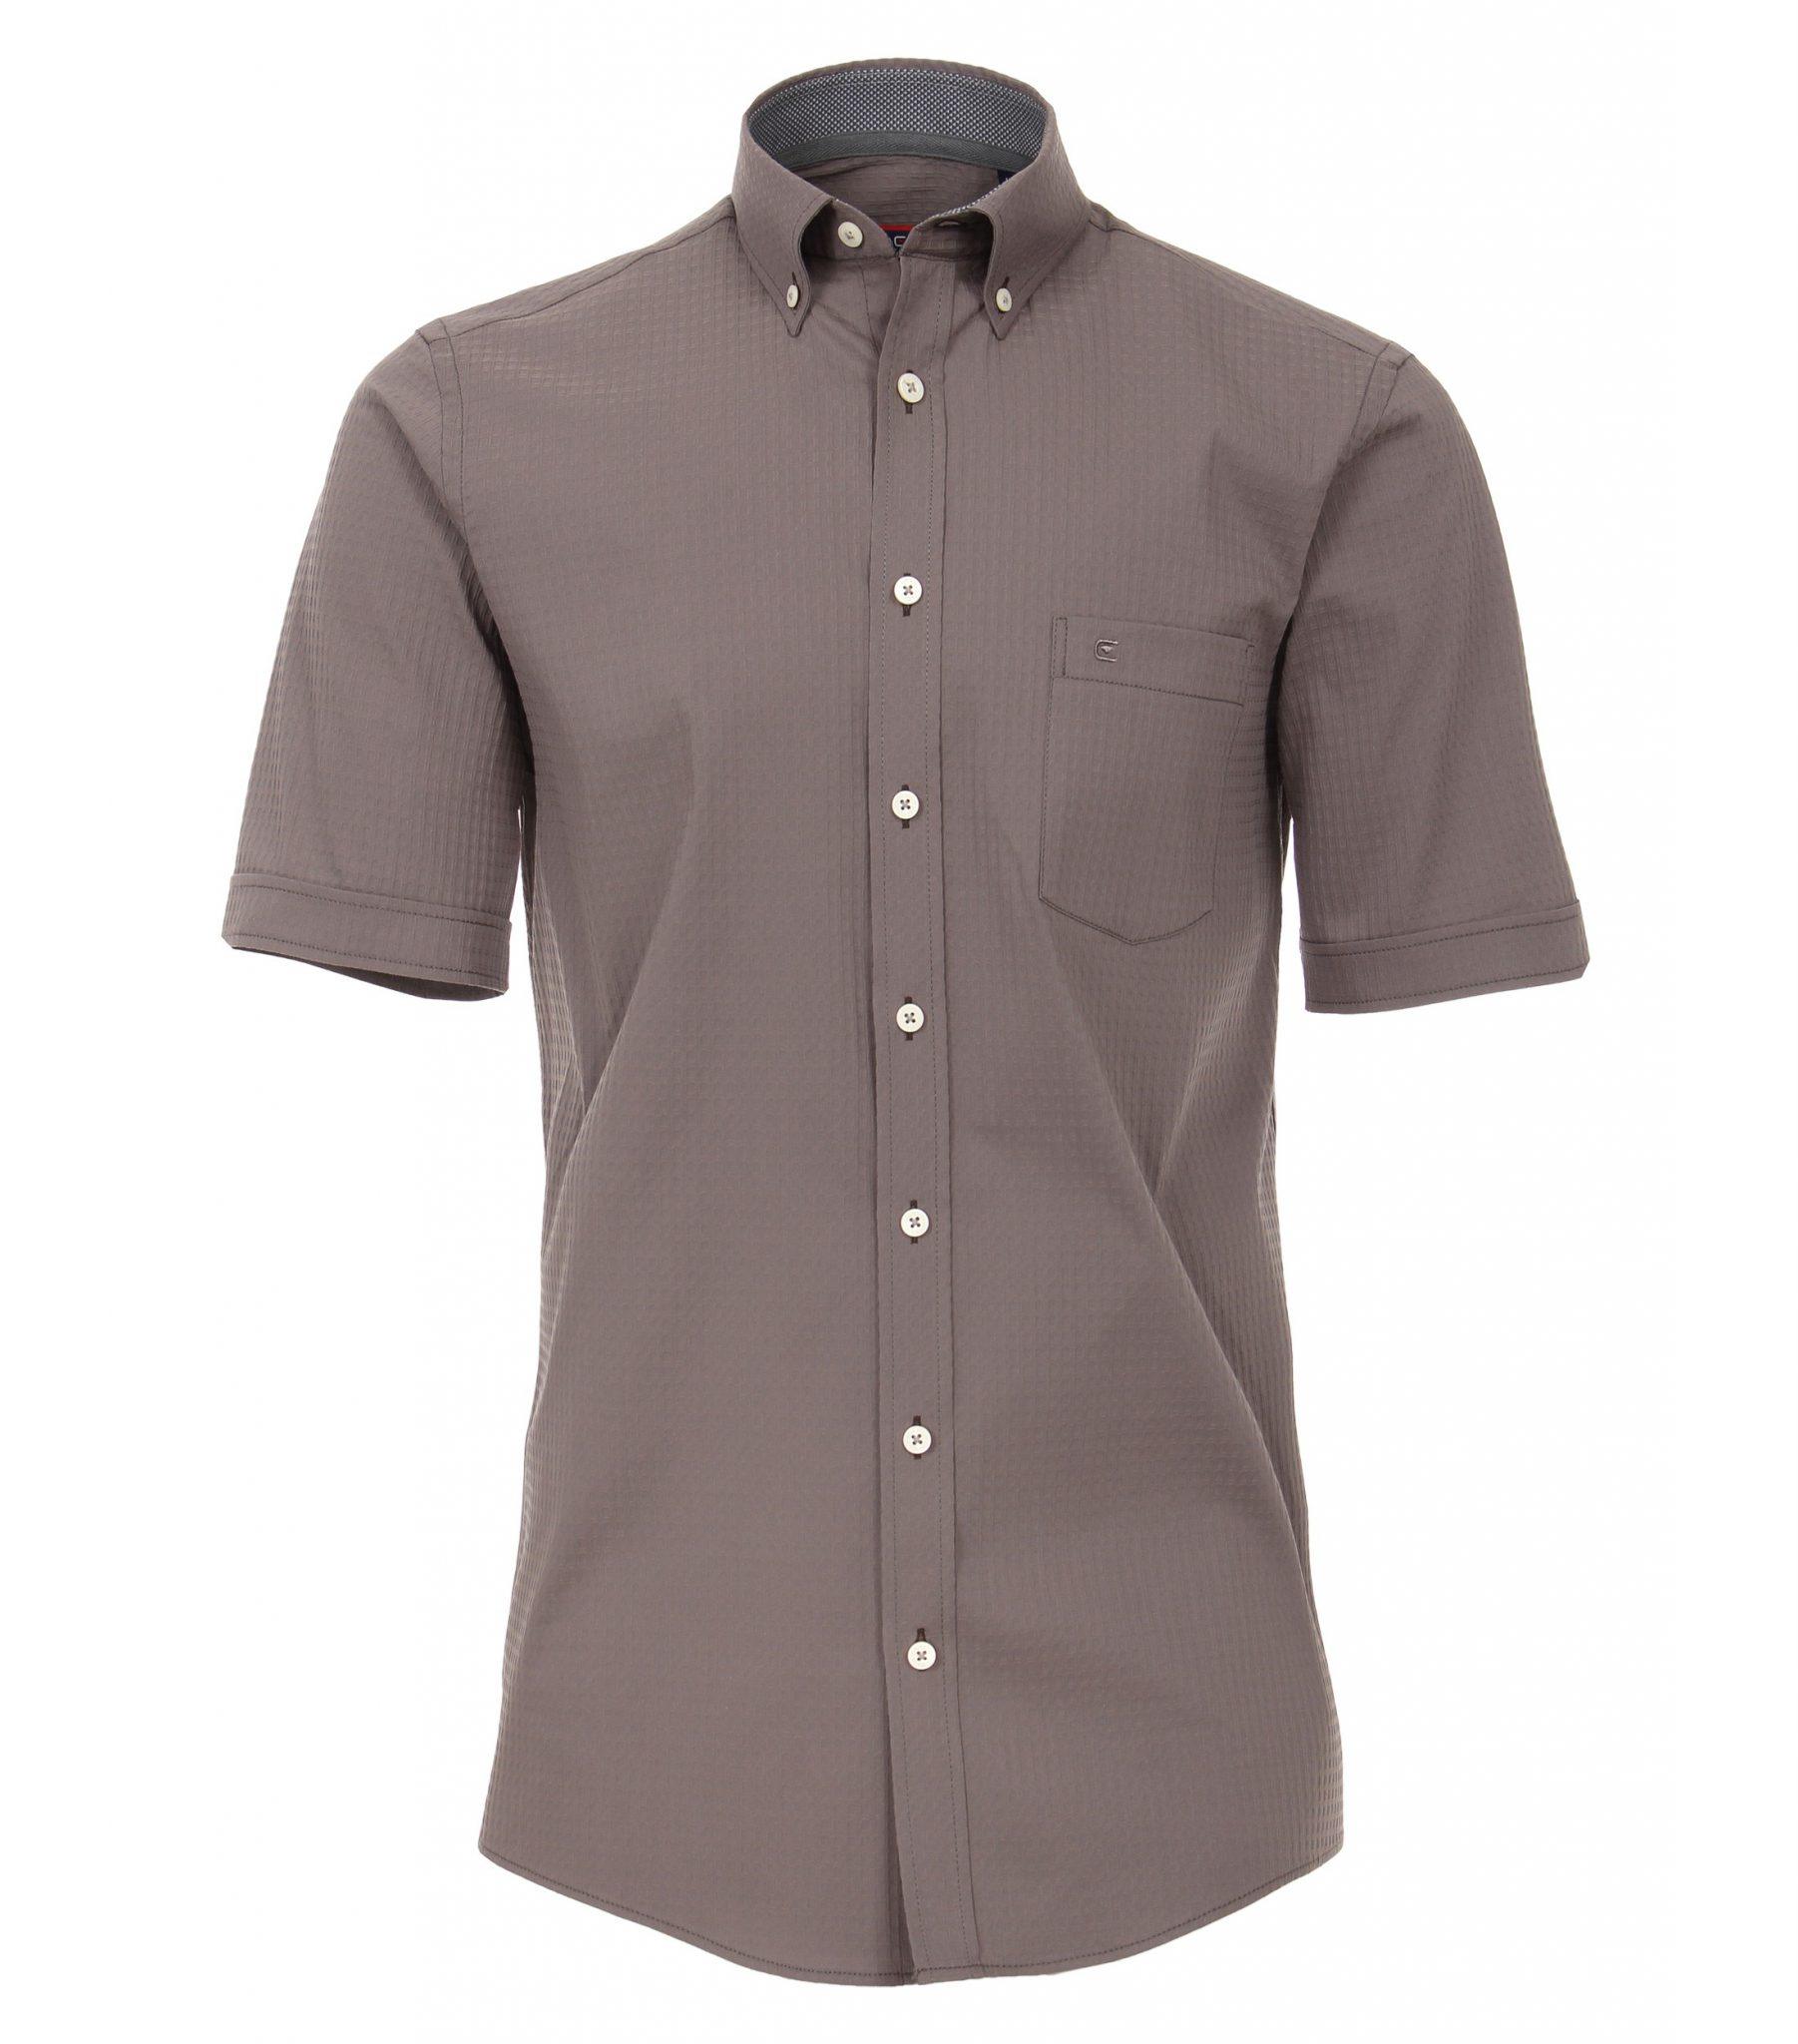 Donkergrijs Overhemd.Casa Moda Grote Maat Overhemd Korte Mouw Donkergrijs